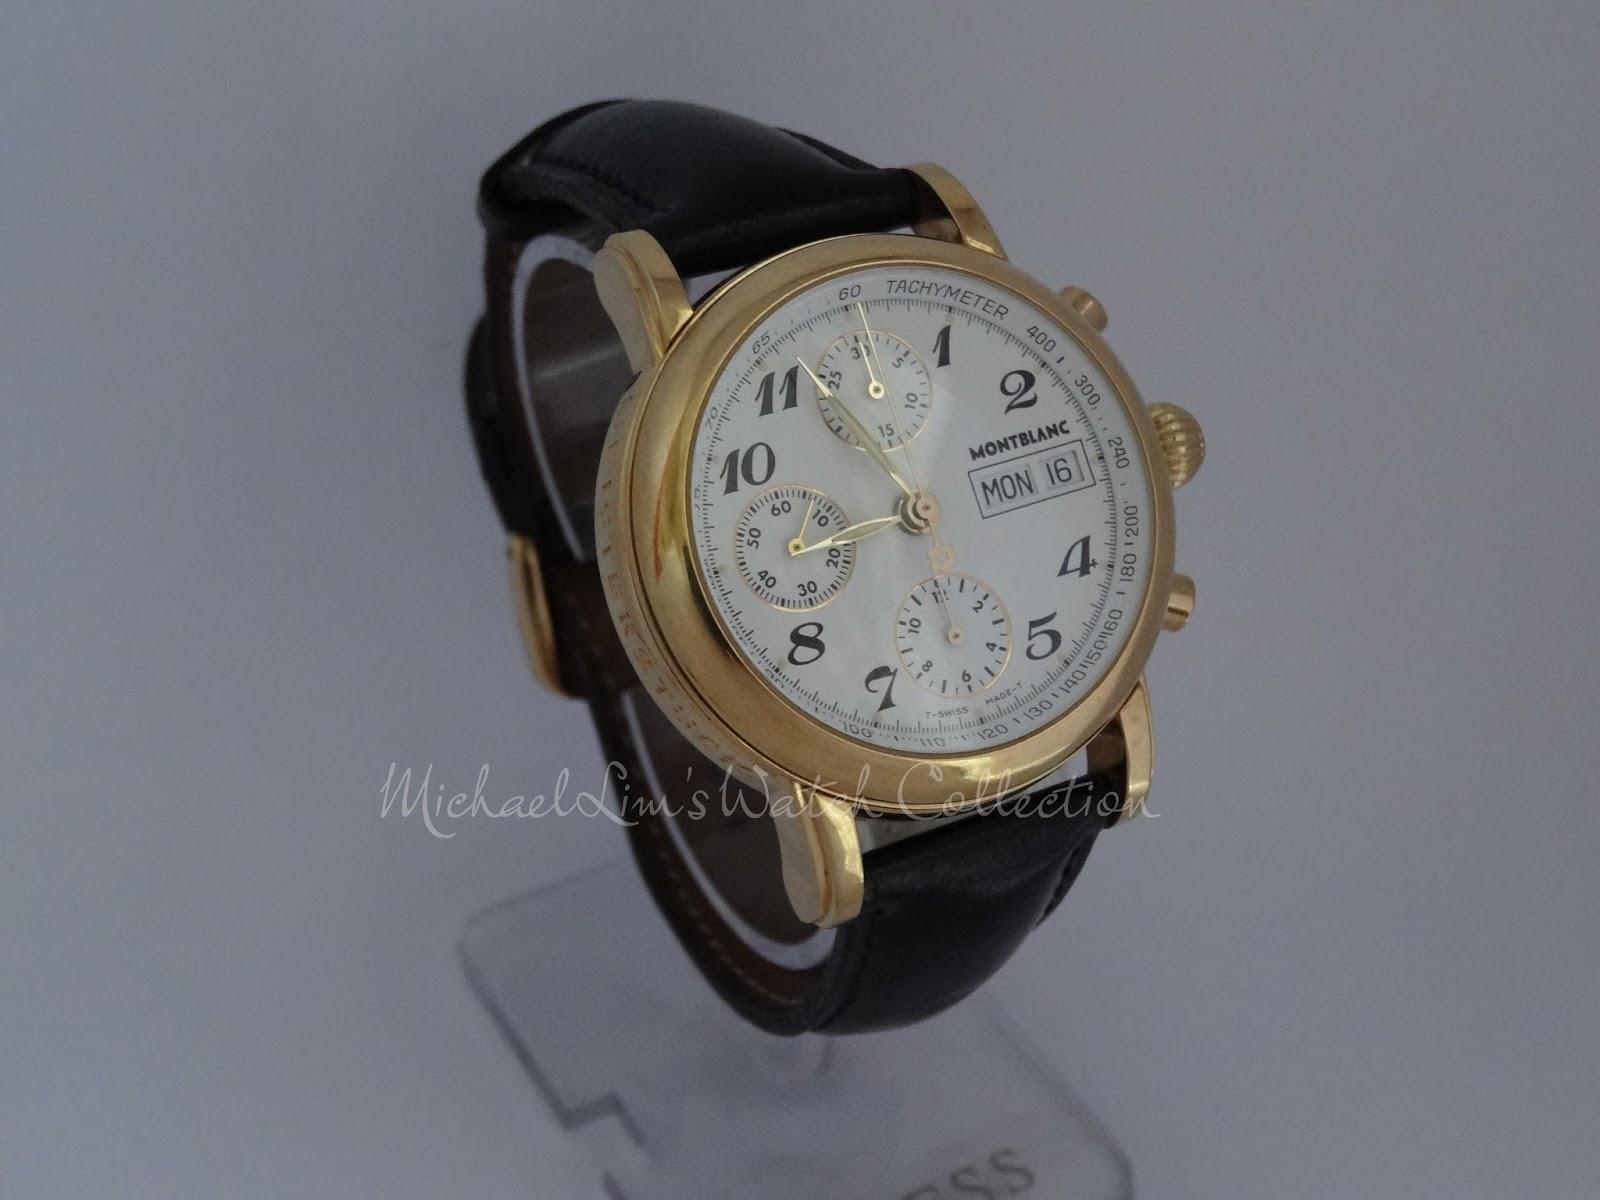 dfca6a6c82fd Brand  Montblanc. Model  Automatic Chronograph Meisterstück 4810 501